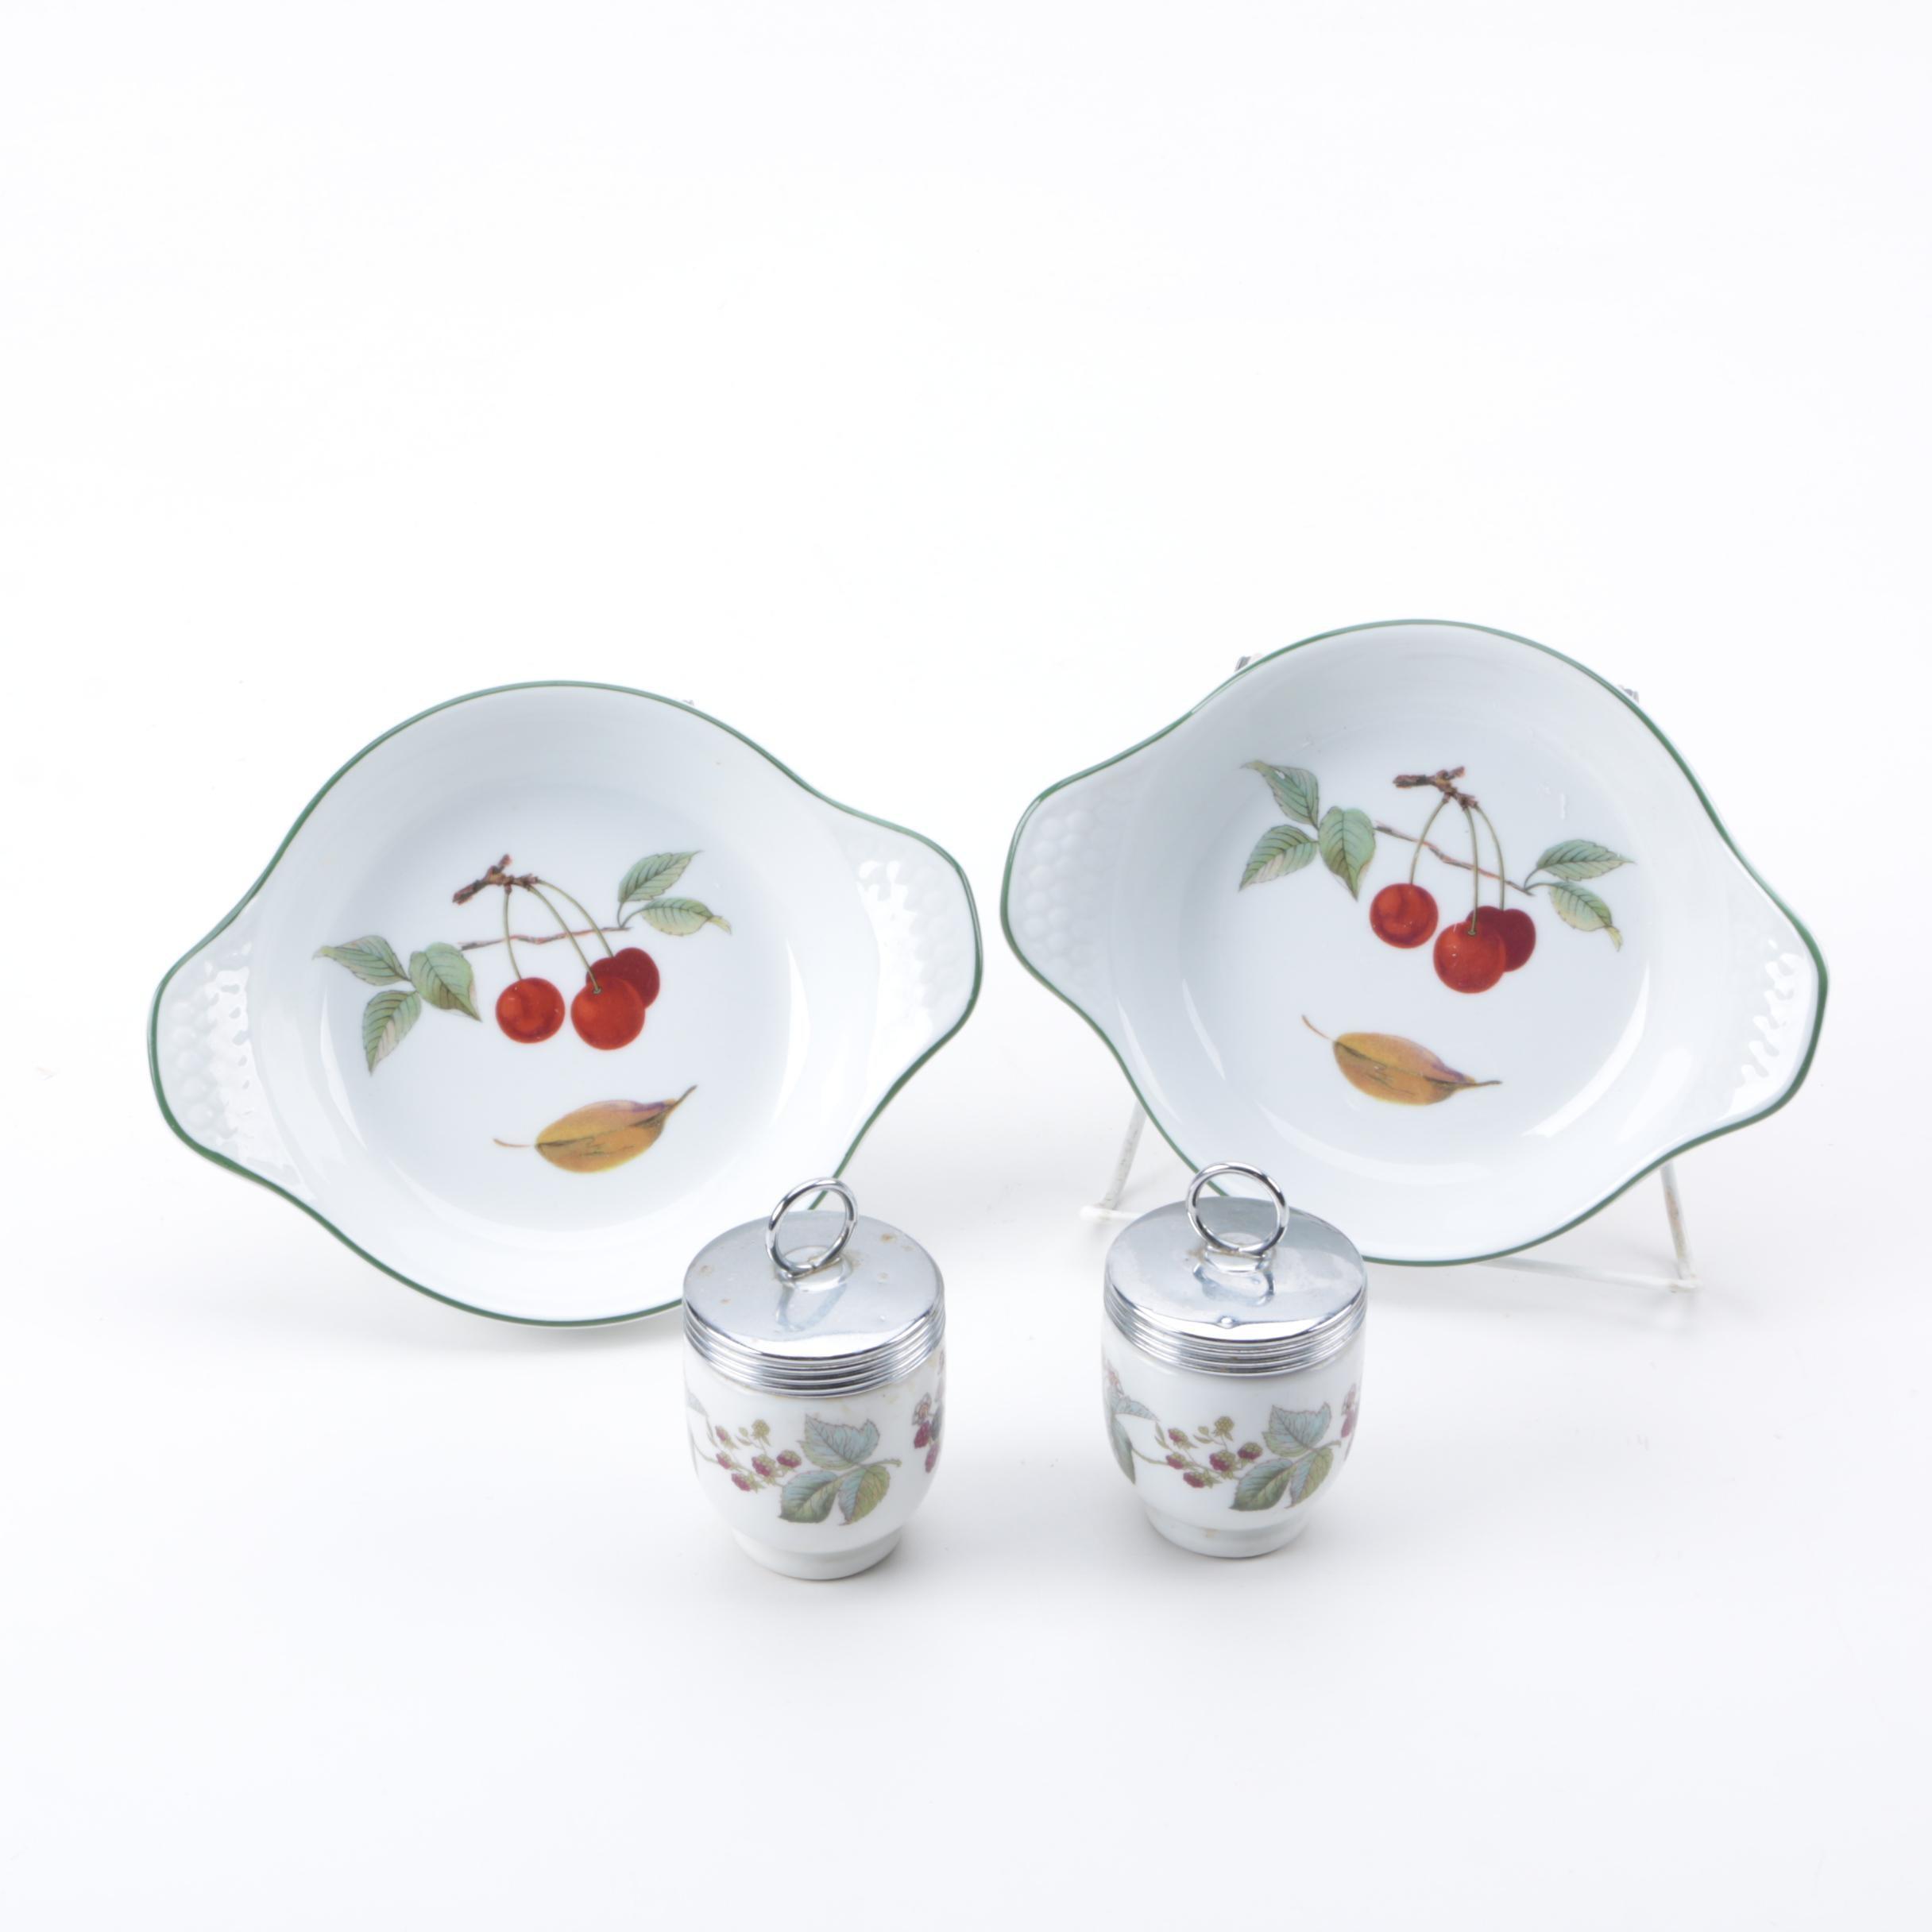 Royal Worcester Ceramic Tableware